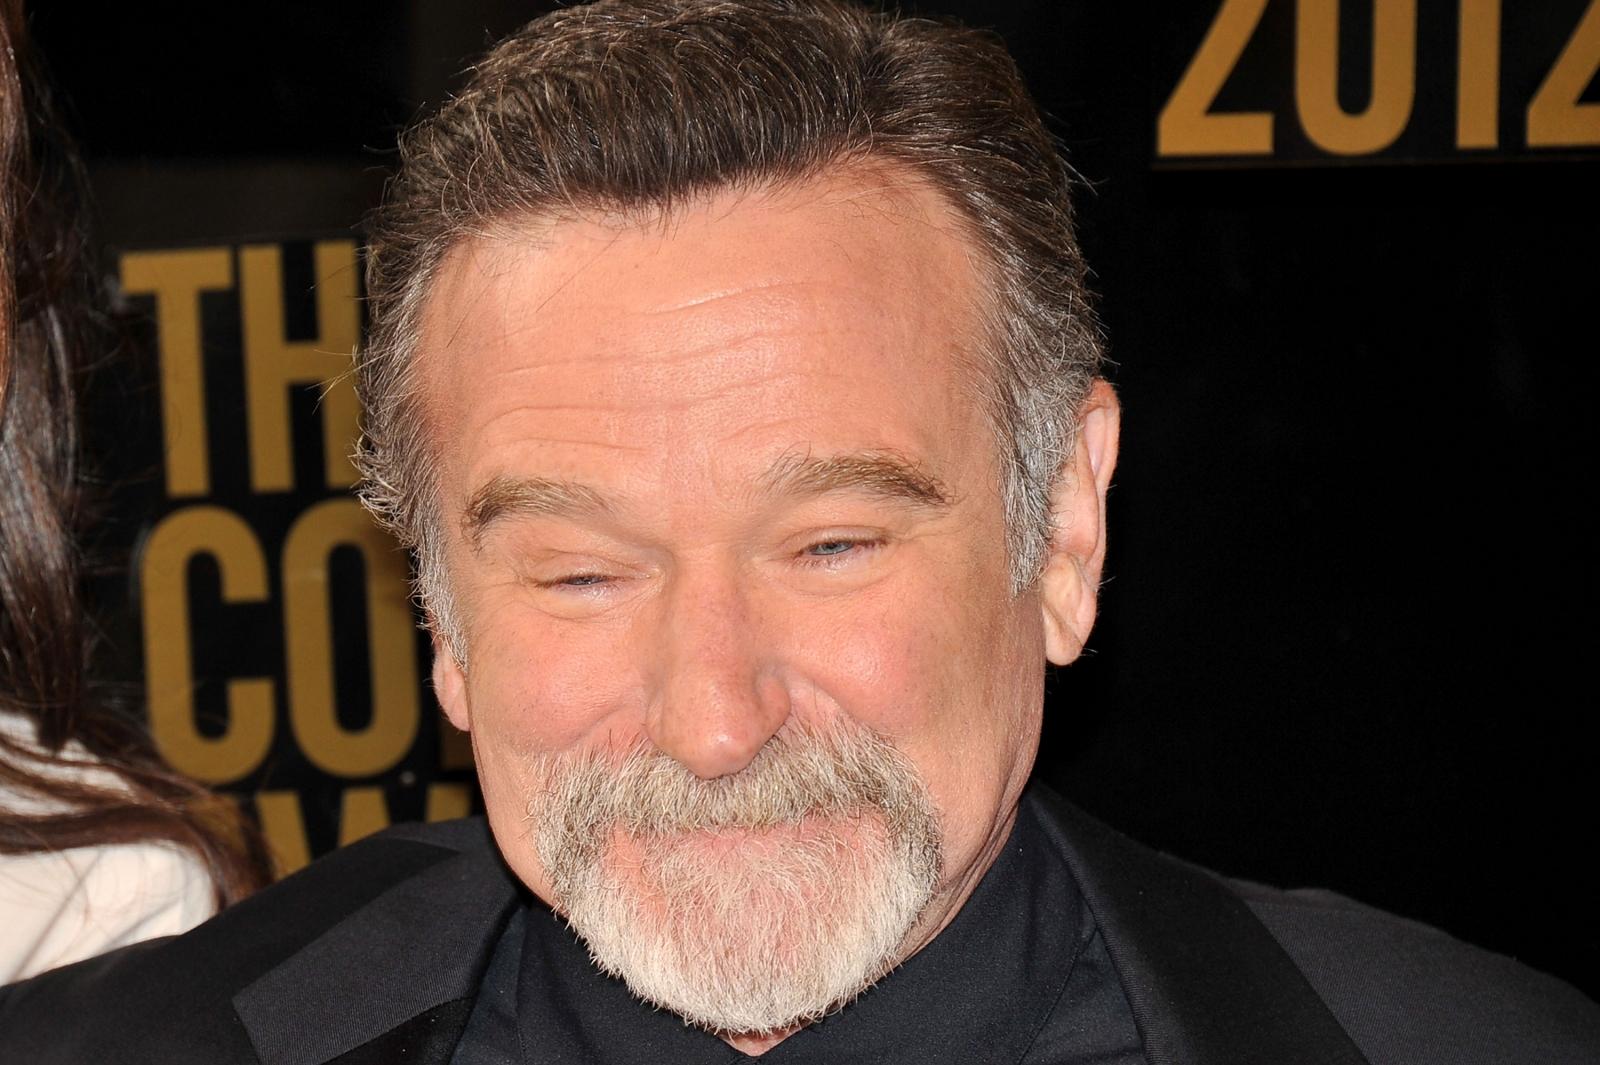 Robin Williams 65th birthday: Daughter Zelda Williams